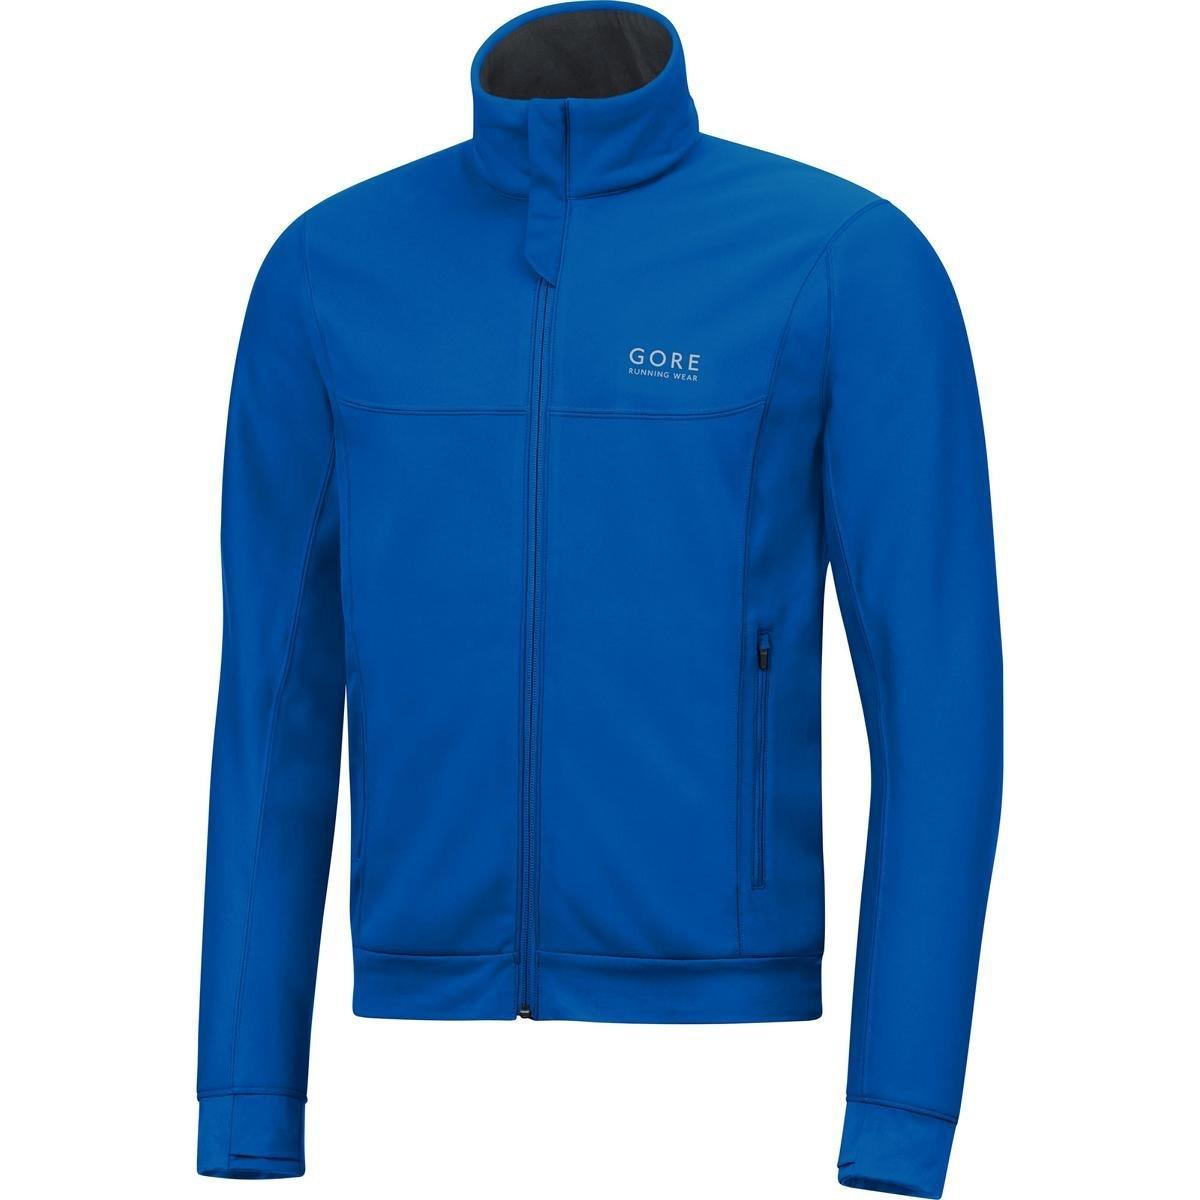 Gore Running Wear Essential Gore Windstopper Jacket – Men 's Medium ブリリアントブルー B01BYJ6HOS